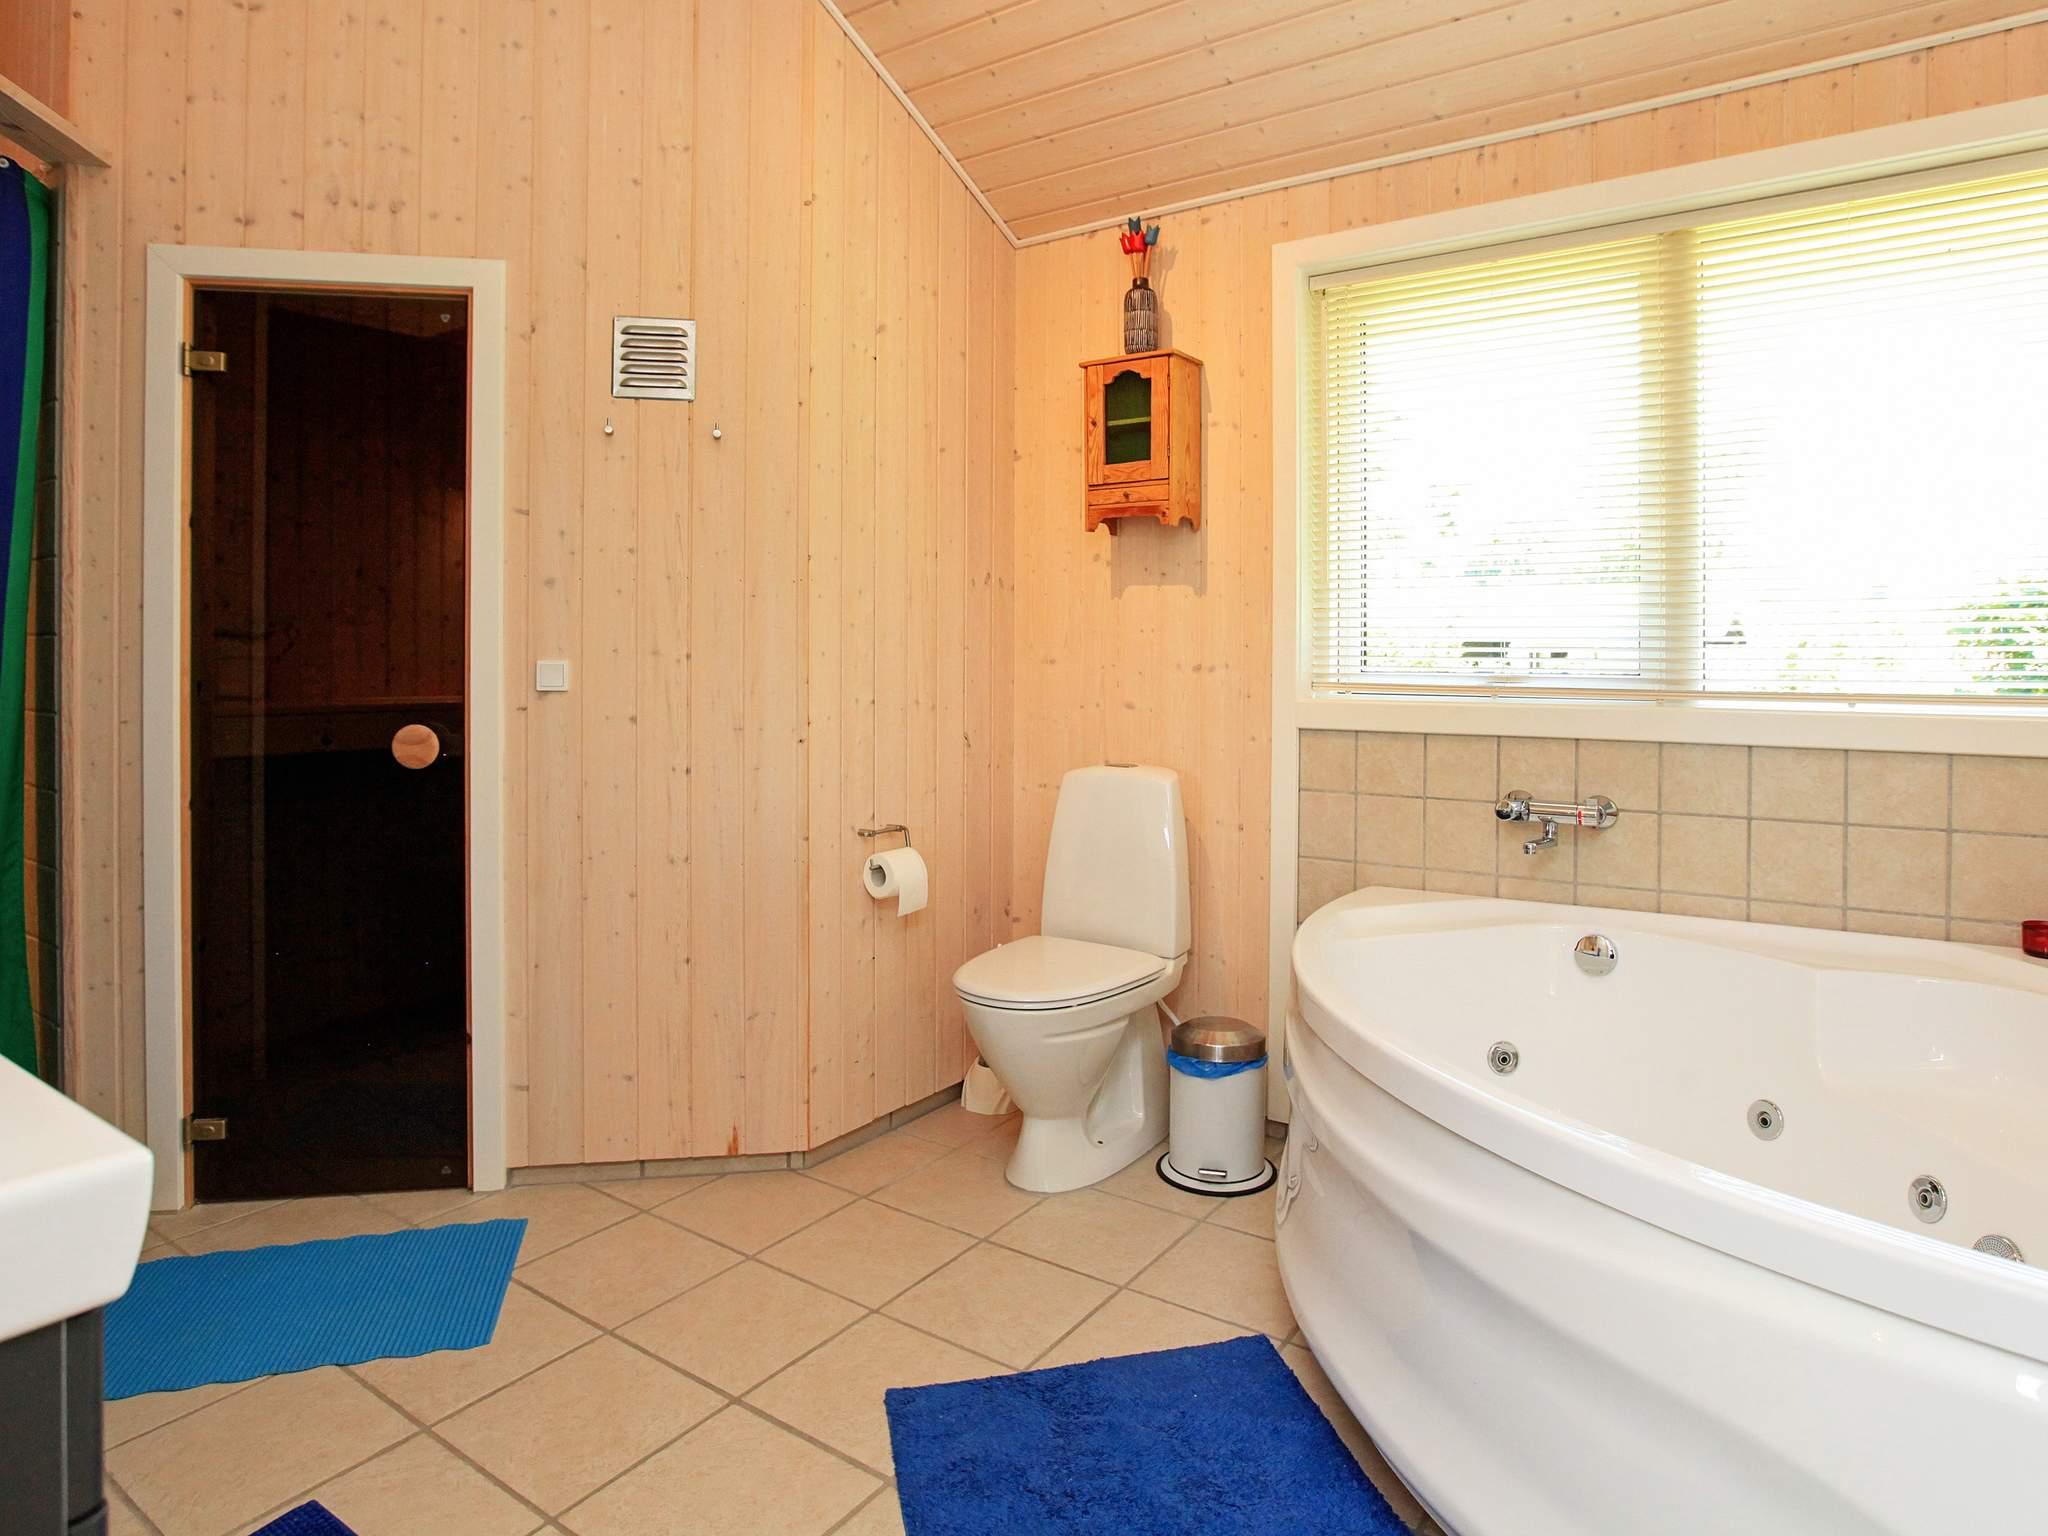 Ferienhaus Vejby Strand (681722), Vejby, , Nordseeland, Dänemark, Bild 14